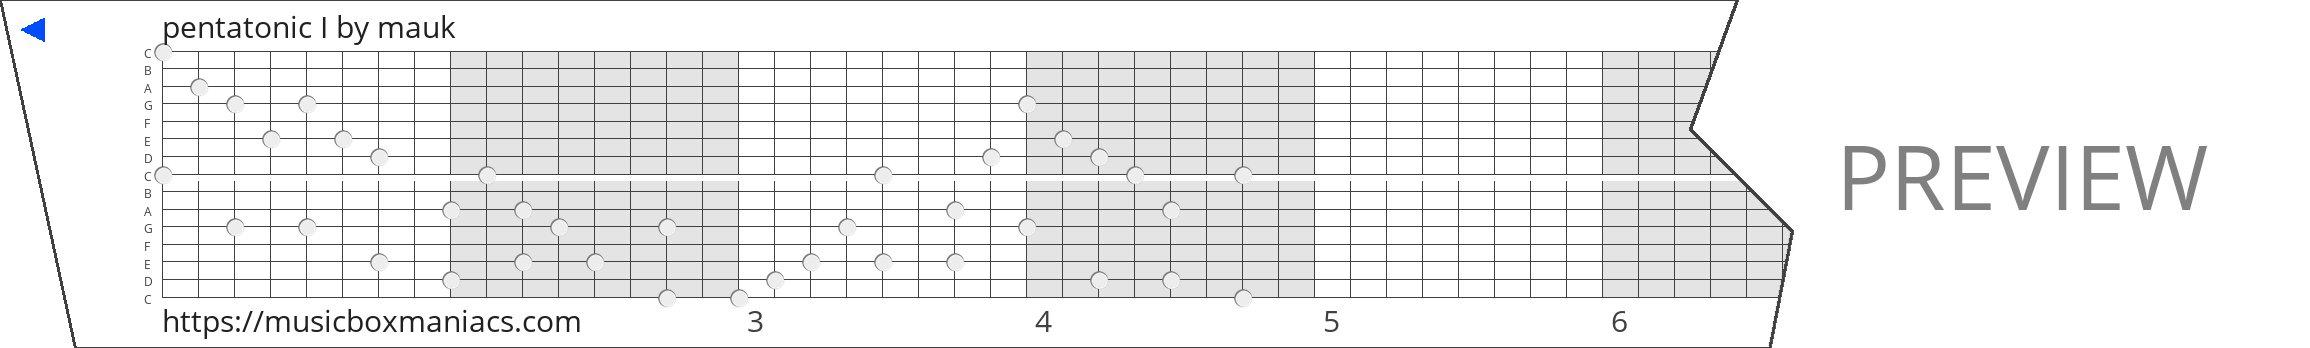 pentatonic I 15 note music box paper strip